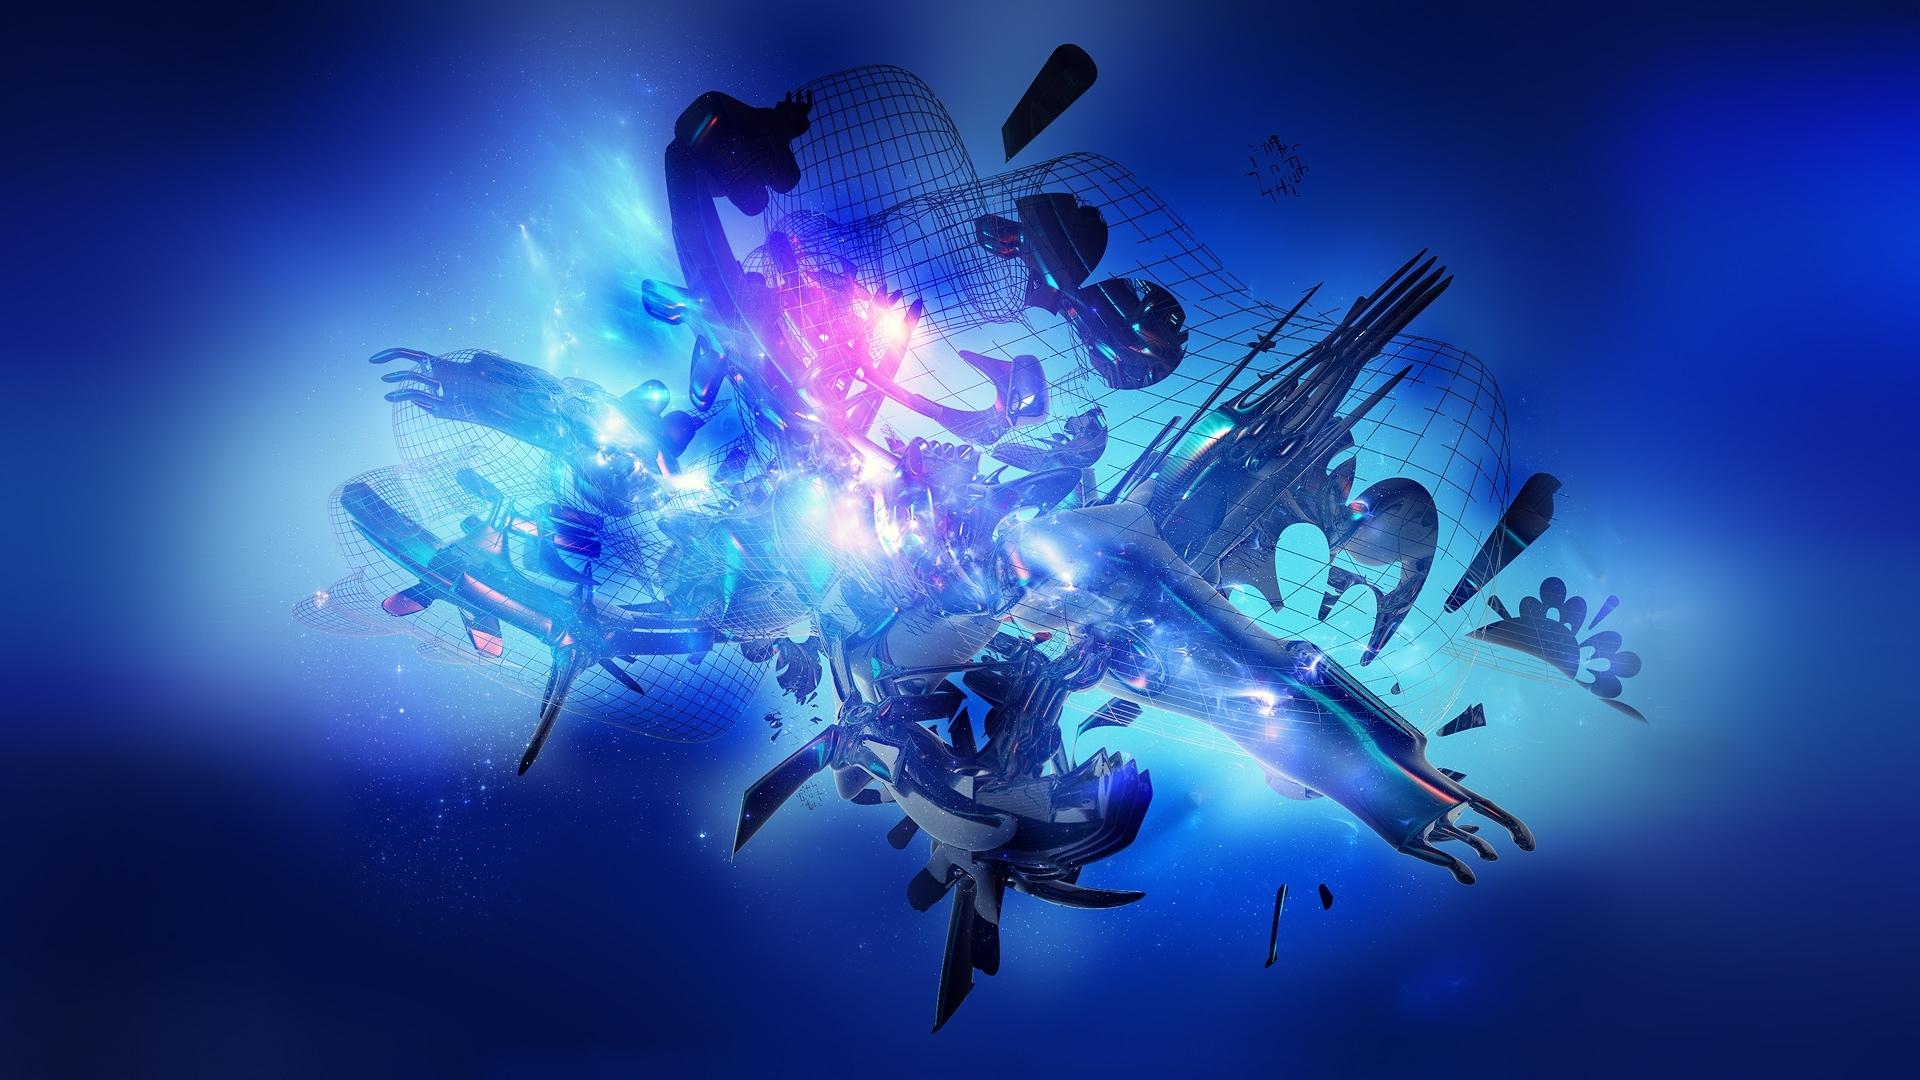 blue abstract hd pics